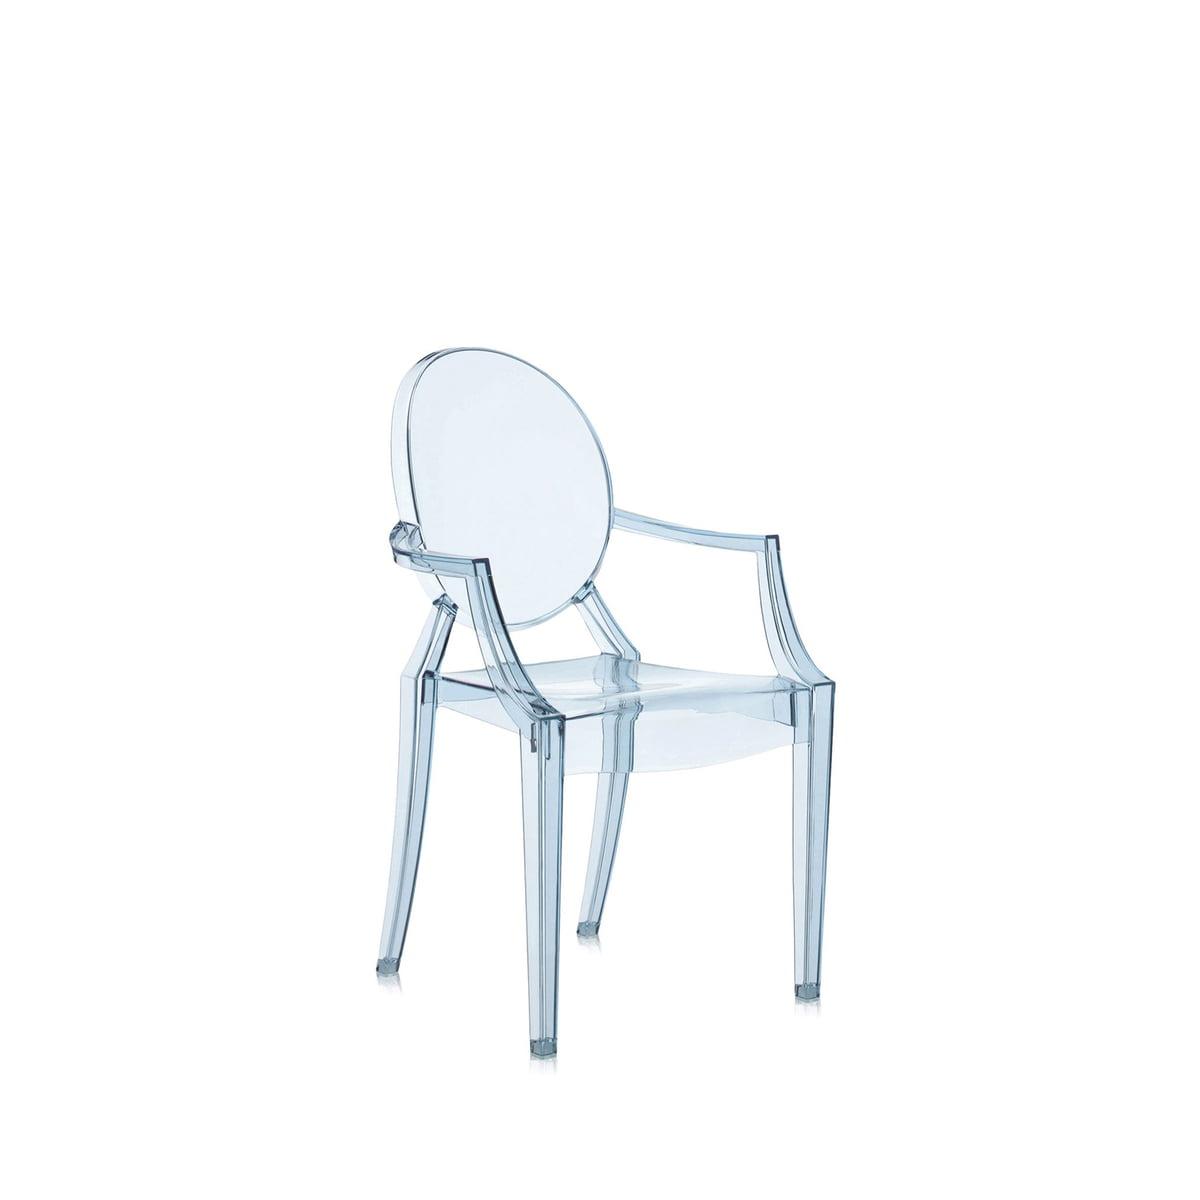 Kartell - Chaise pour enfant Lou Lou Ghost, bleu glace